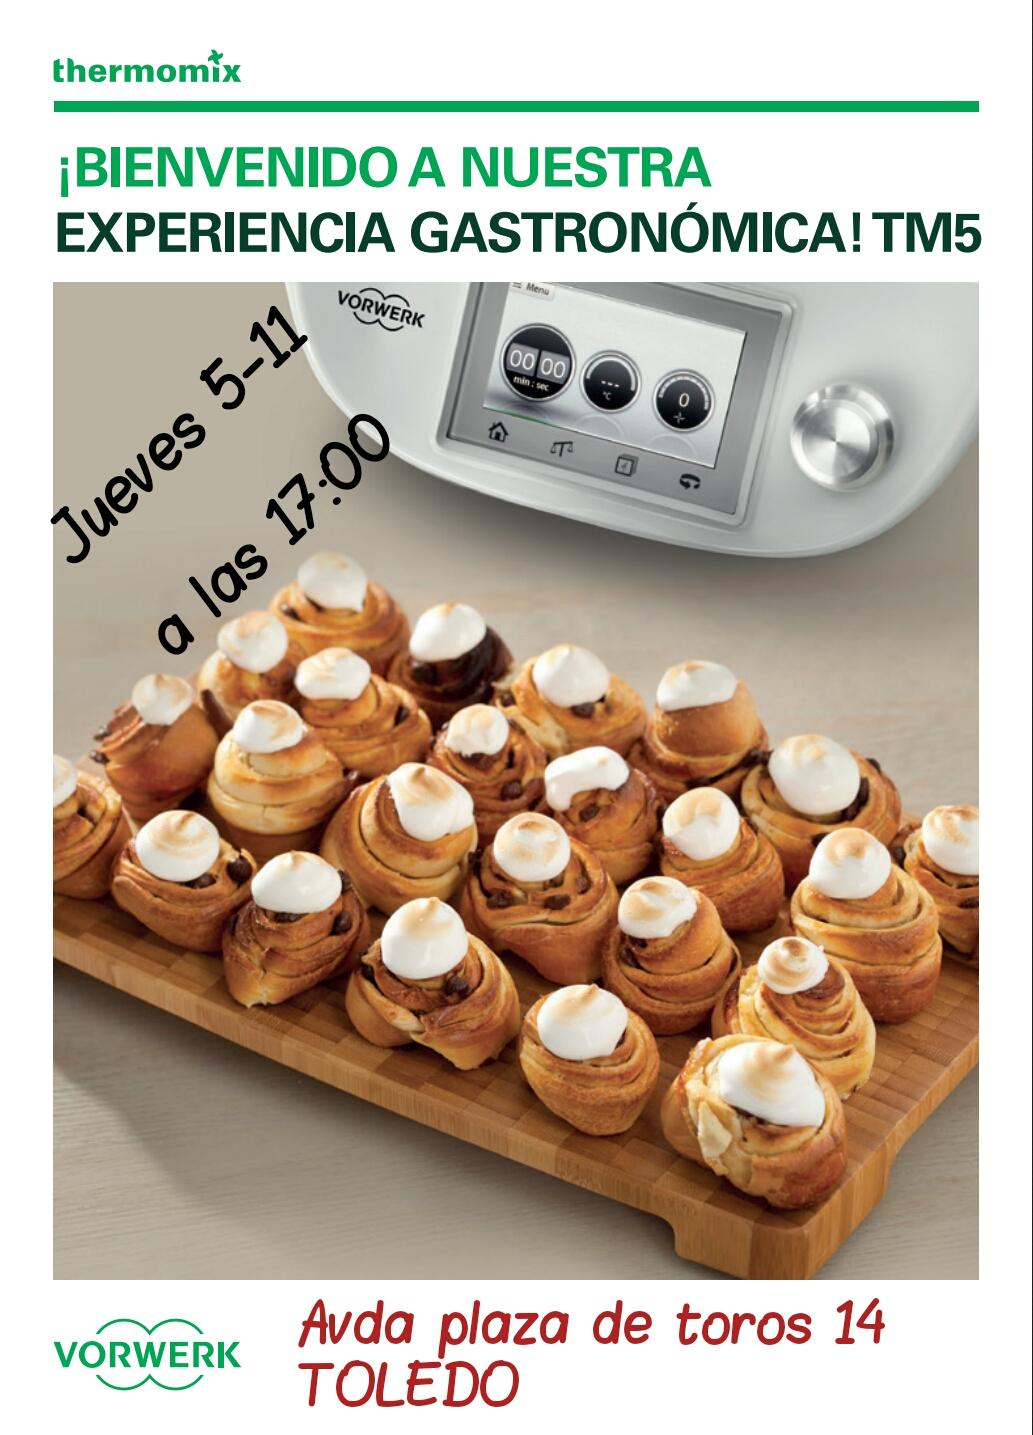 FINALIZADO - Clase de cocina para nuevos clientes de Thermomix® toledo